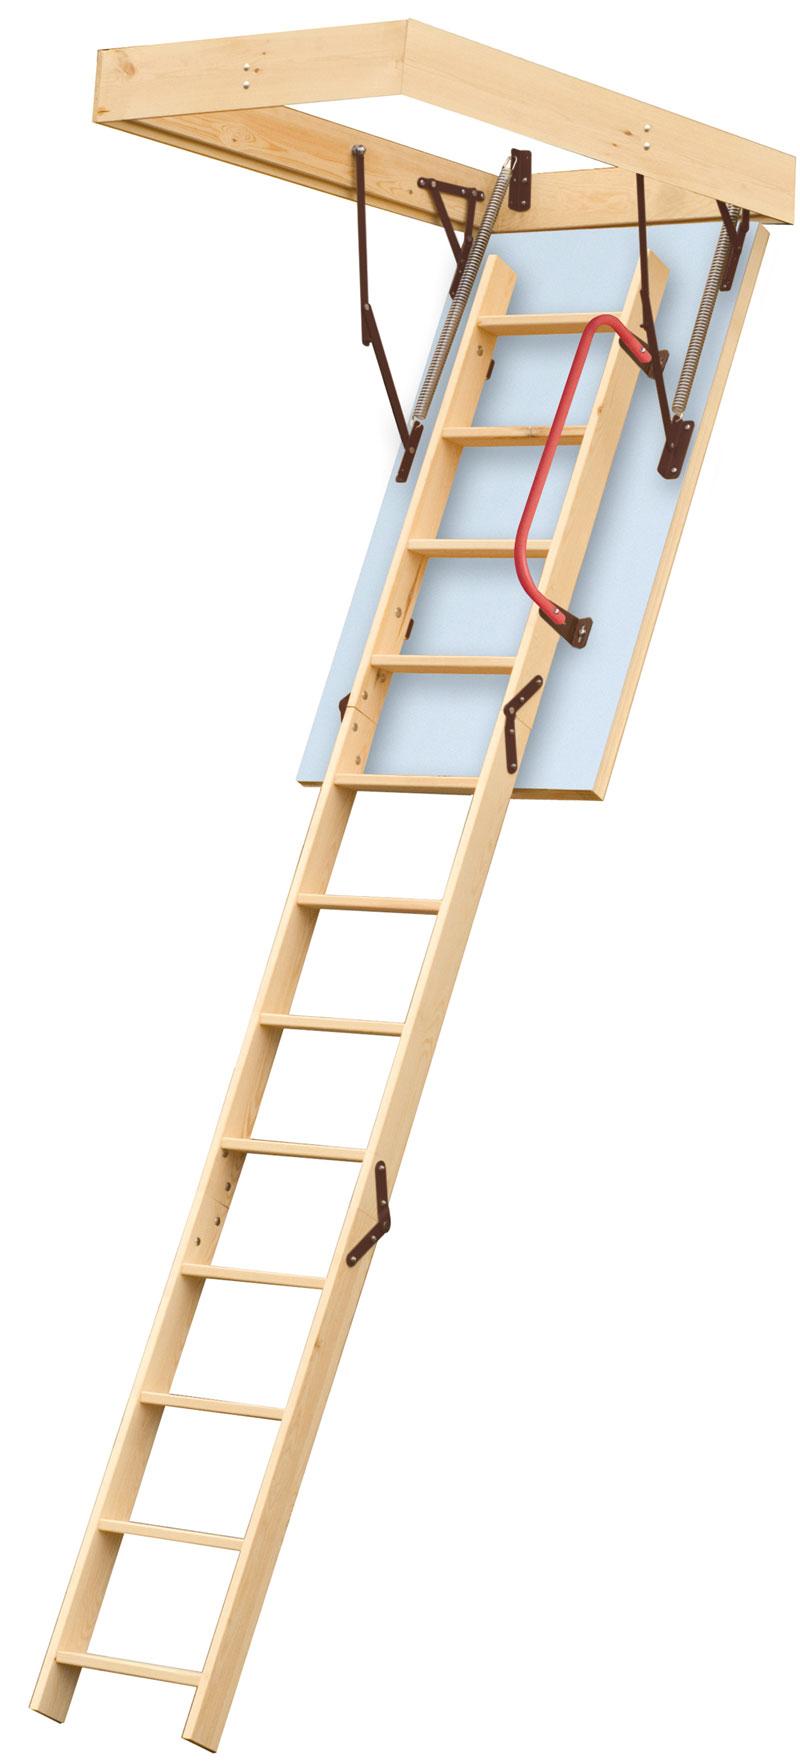 Lyte Timber Loft Ladder Hulley Ladders